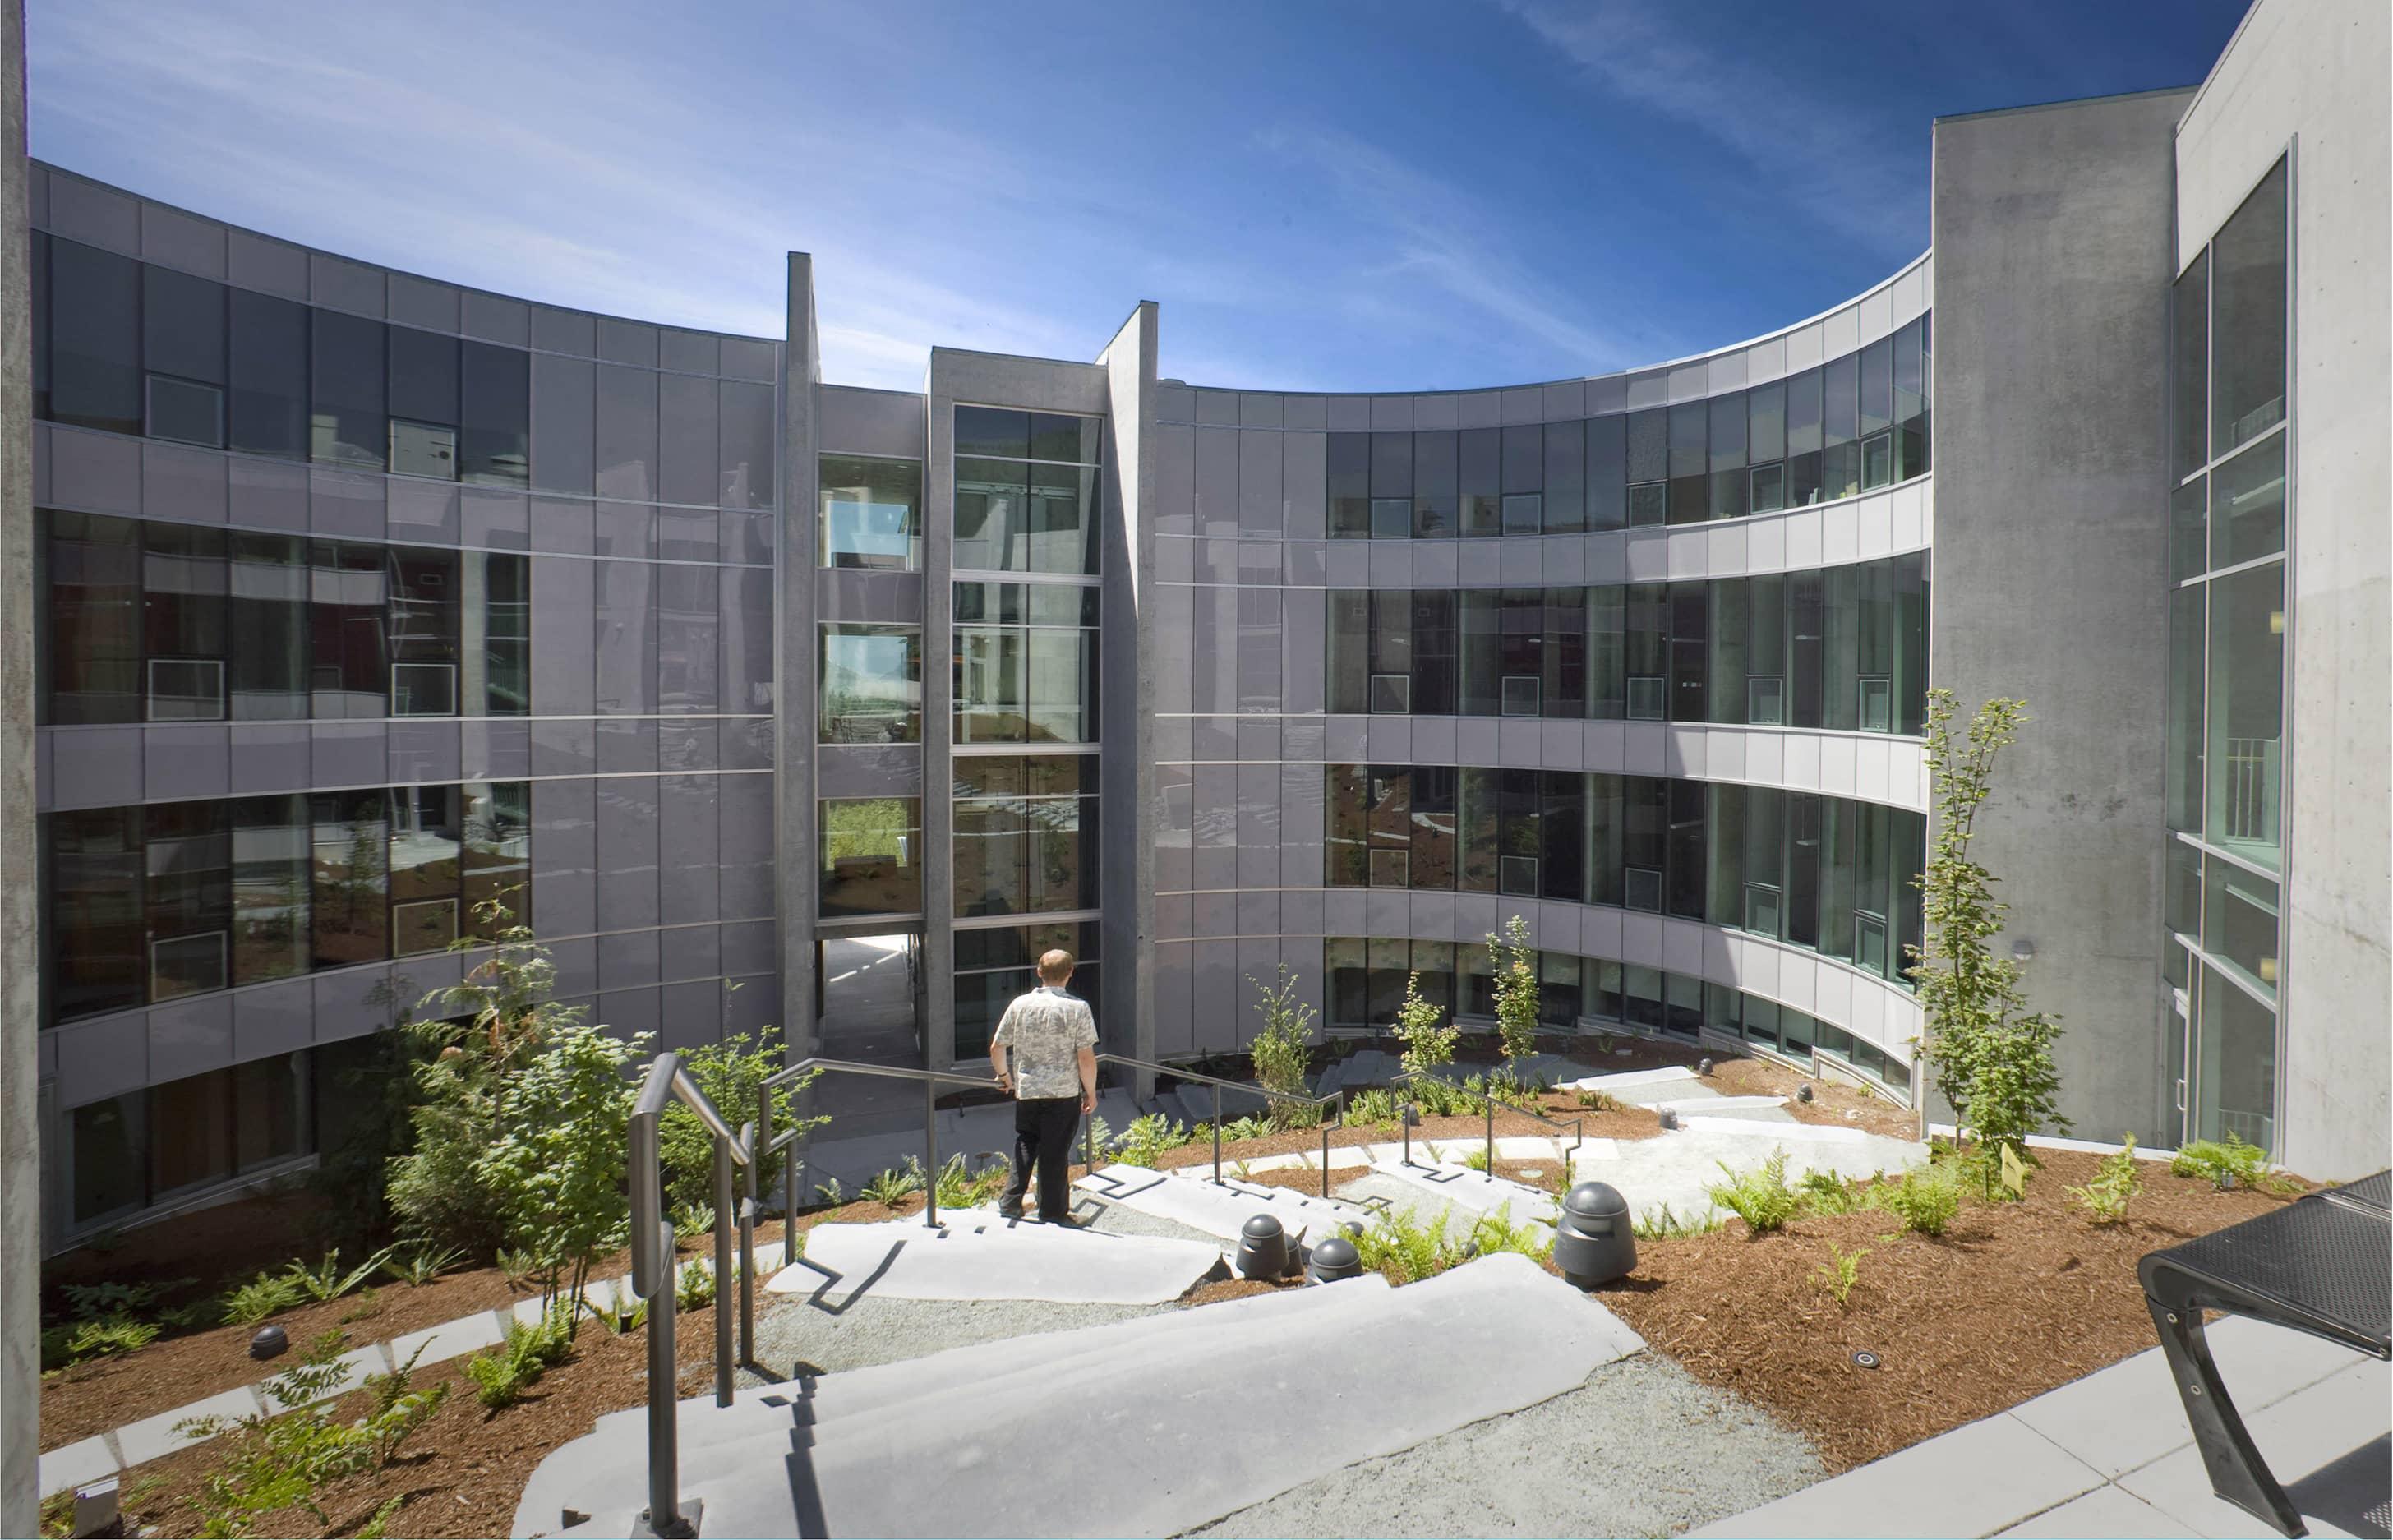 bbp quest university courtyard